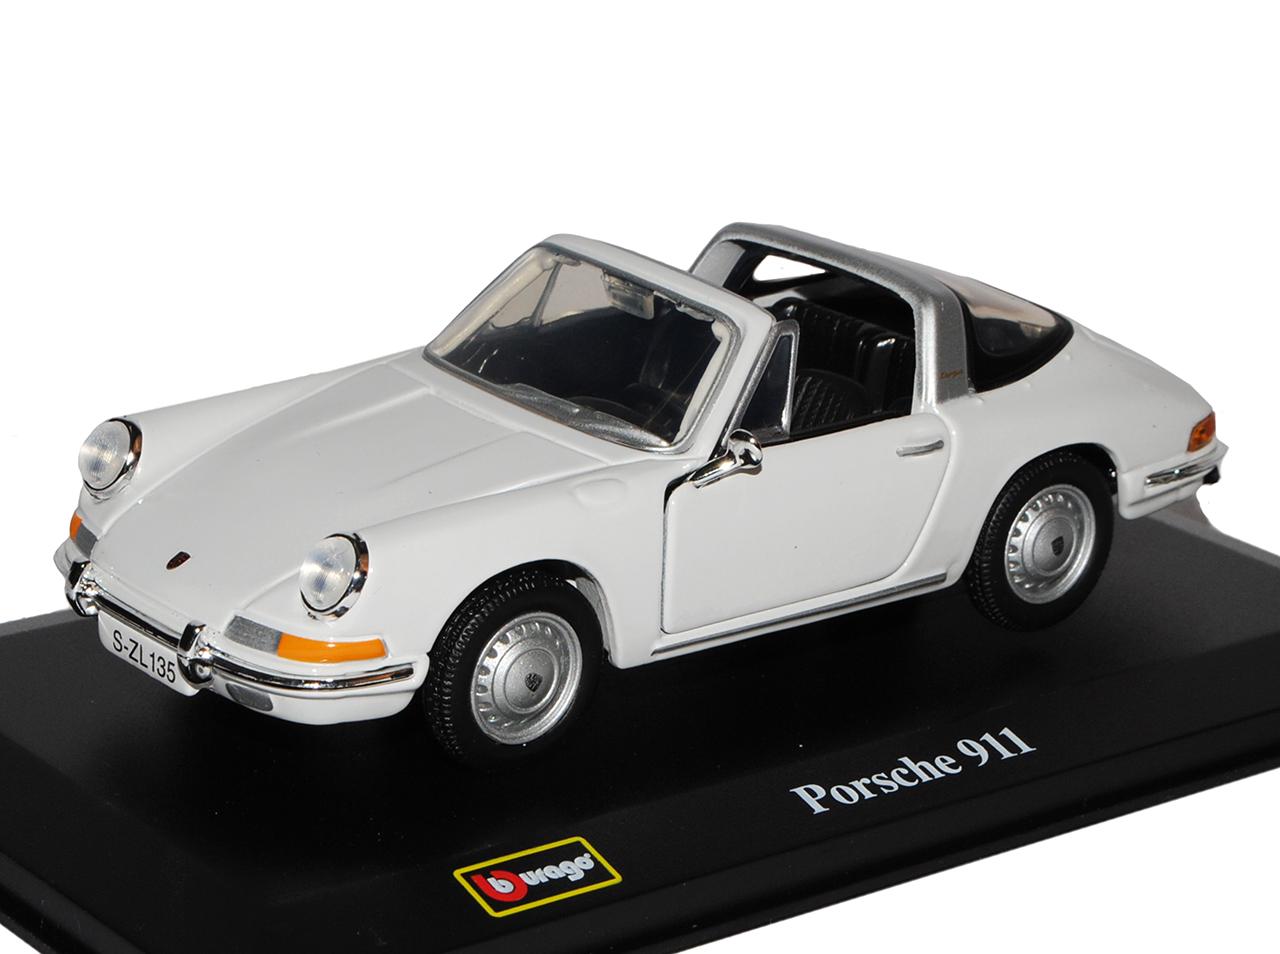 Porsche 911 Urmodell Targa Weiss 1963-1973 1//32 Bburago Modell Auto mit oder o..